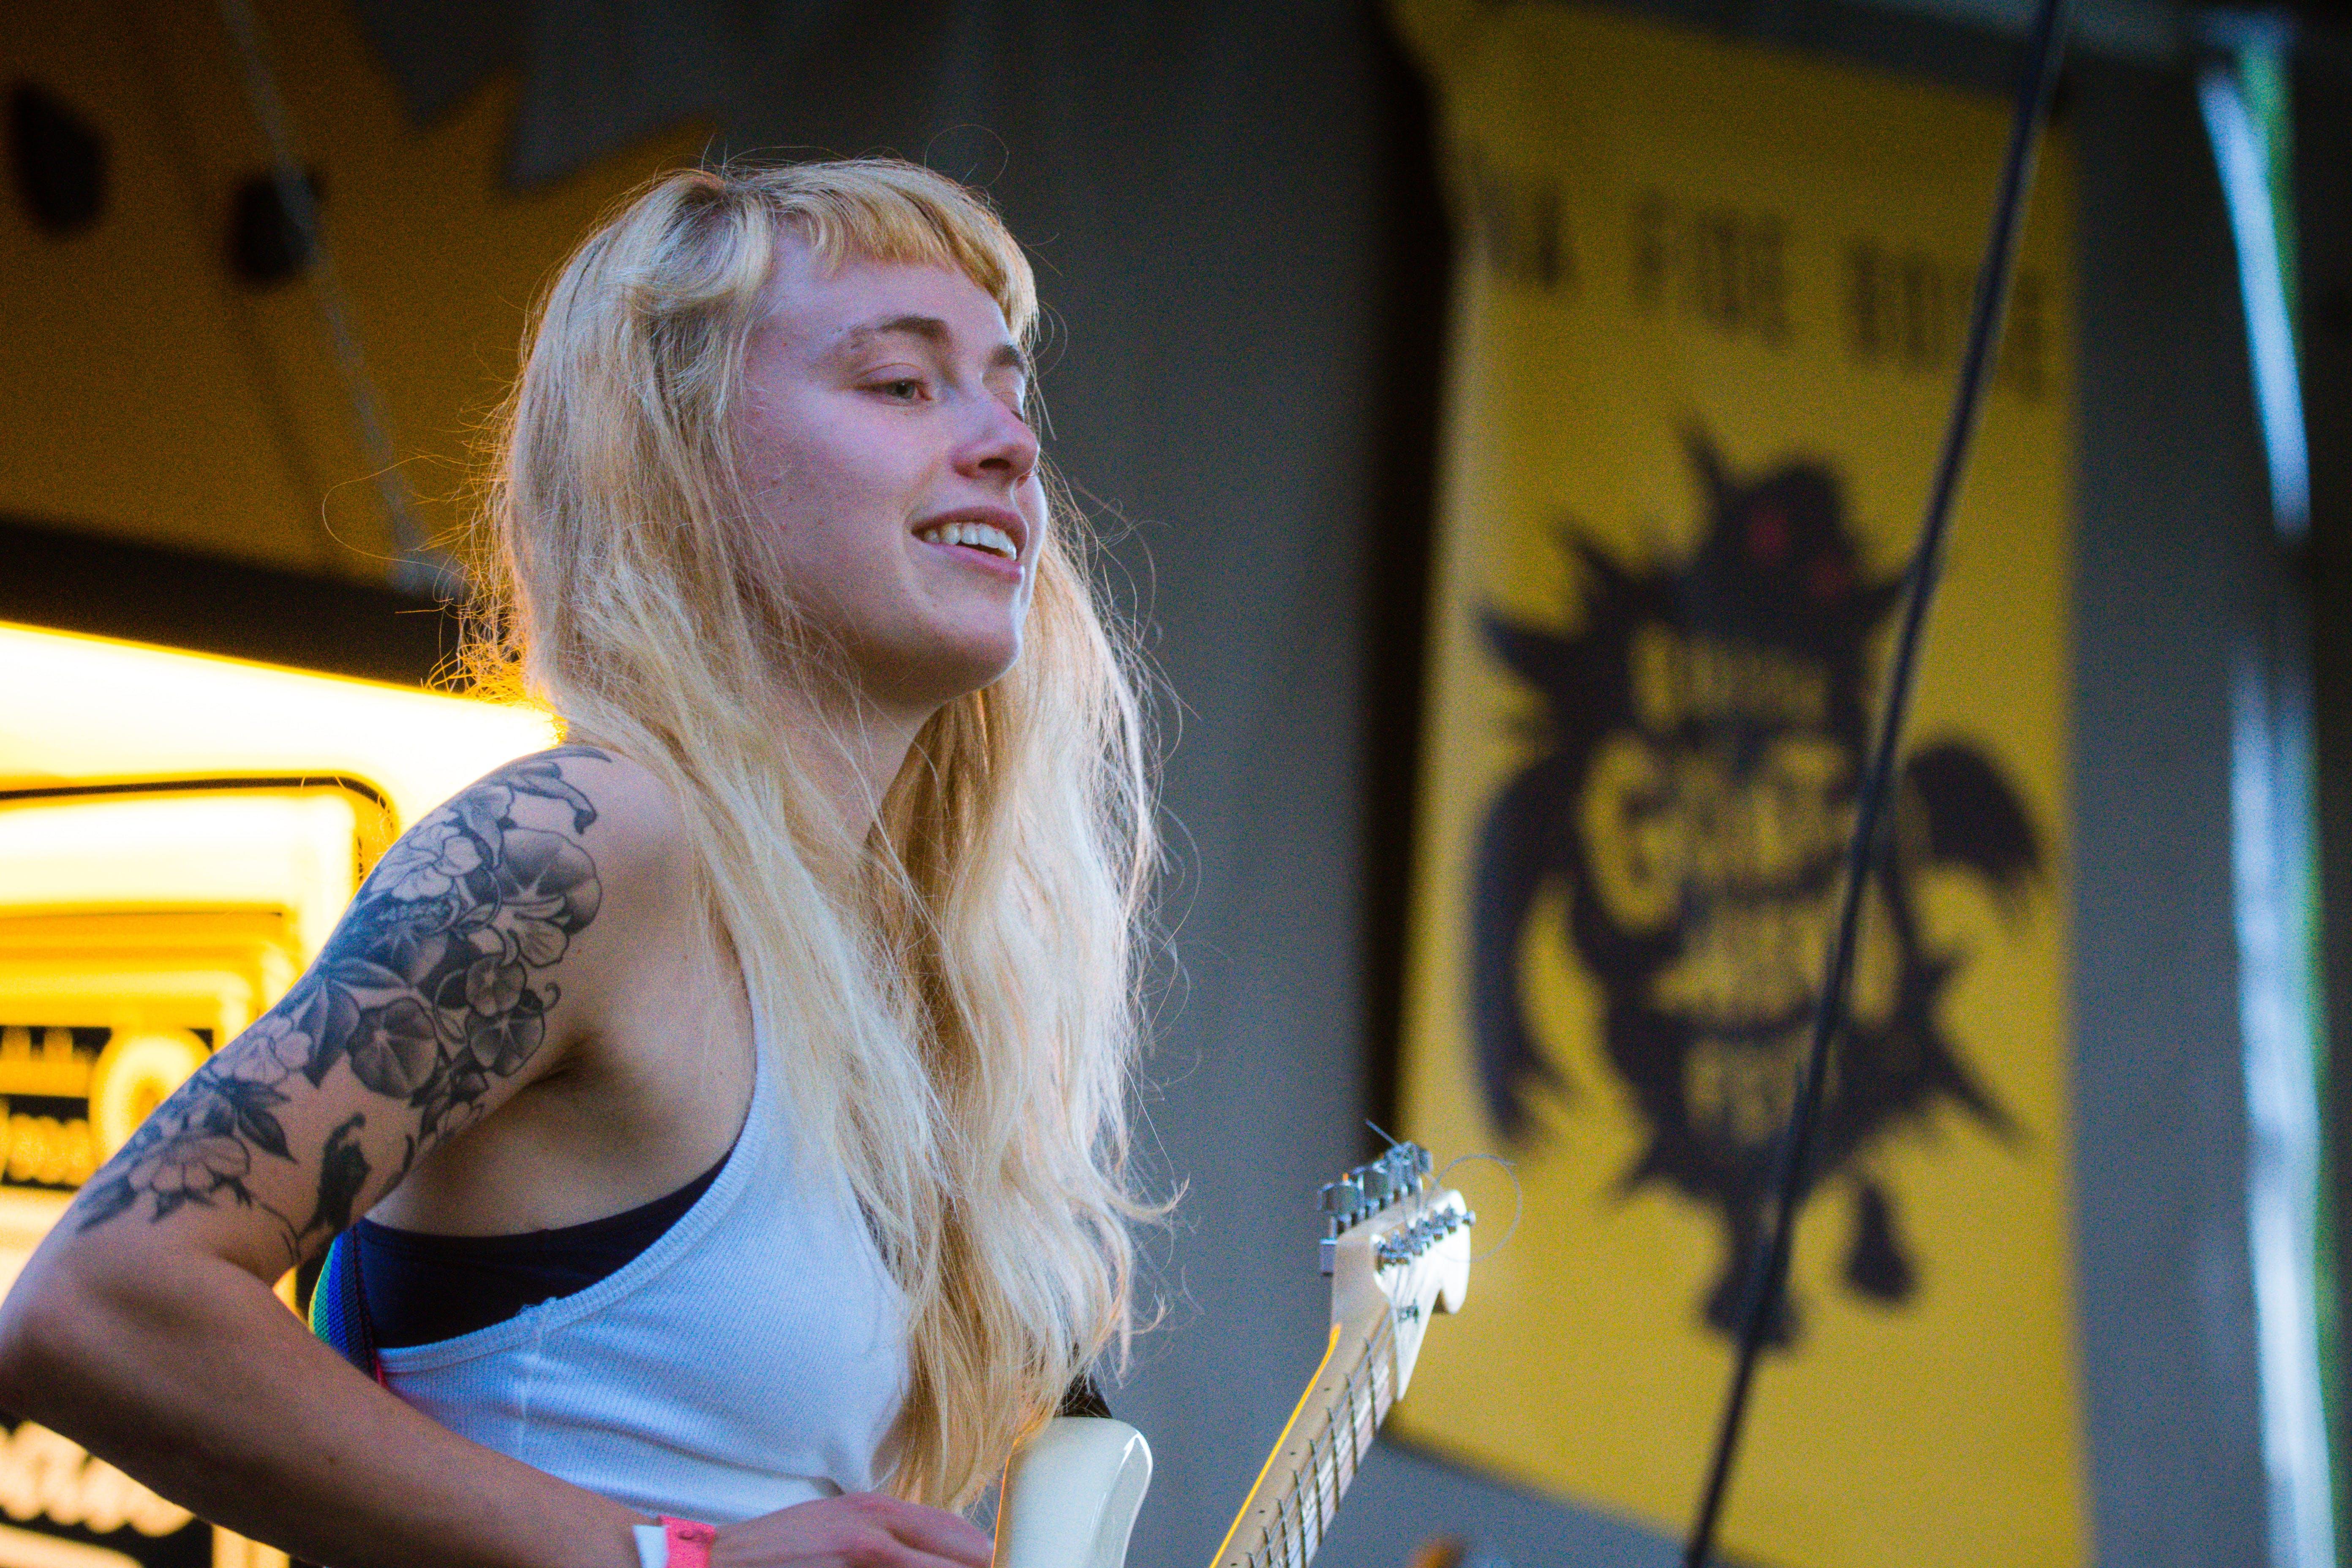 Woman Wearing White Tank Top Playing White Electric Guitar